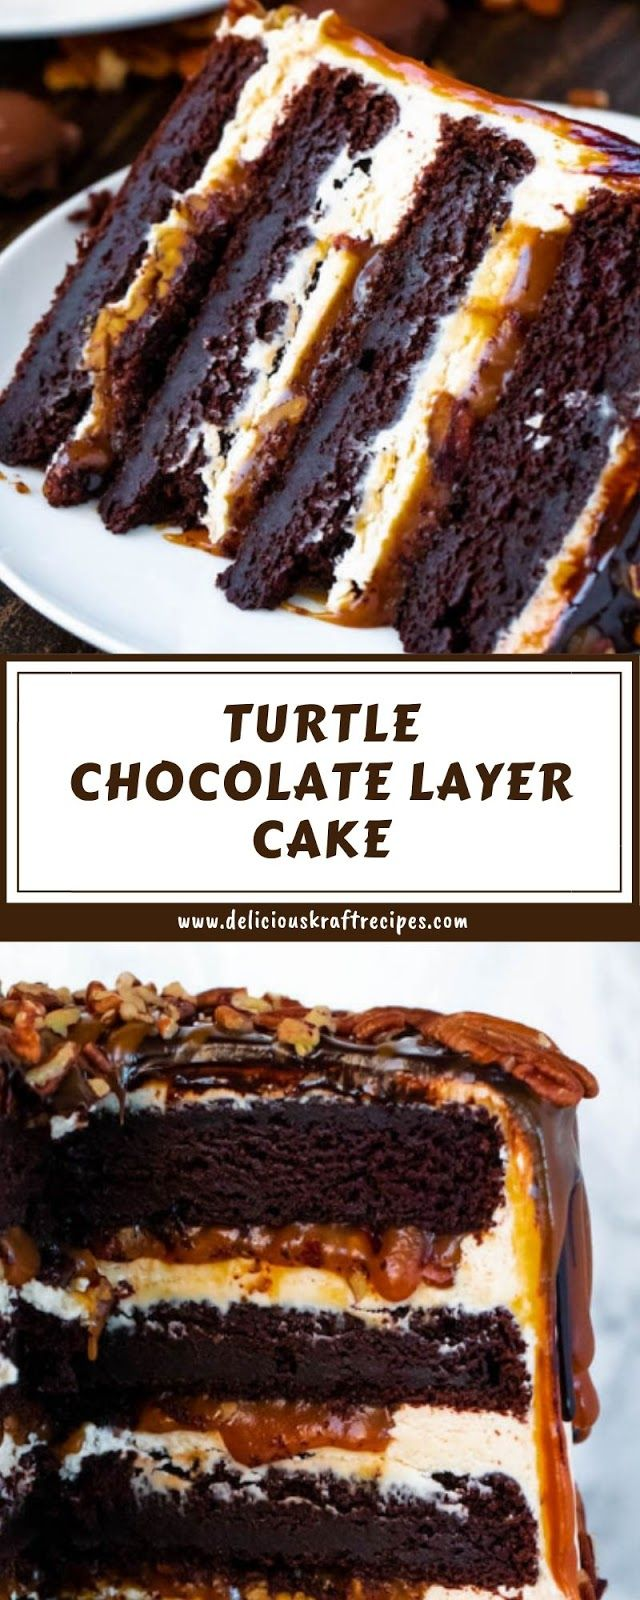 TURTLE CHOCOLATE LAYER CAKE #chocolatecake